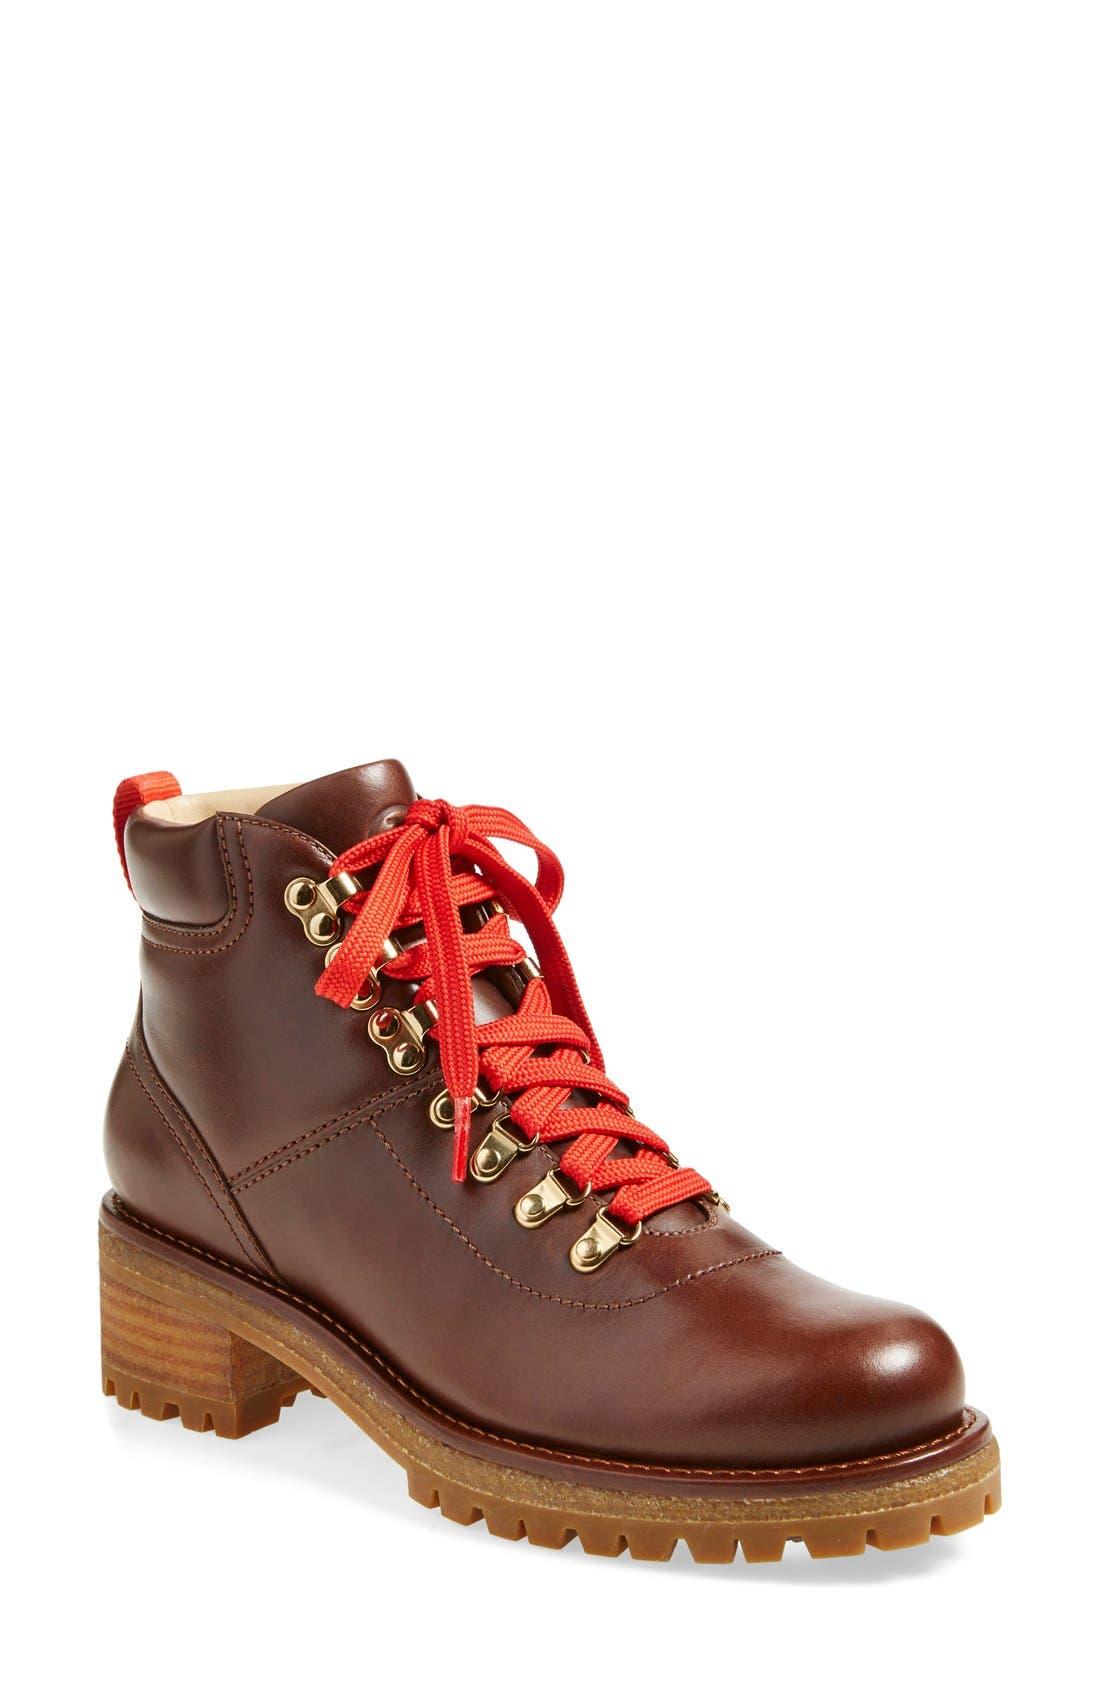 'Gunton' Ankle Hiking Boot,                             Main thumbnail 1, color,                             200